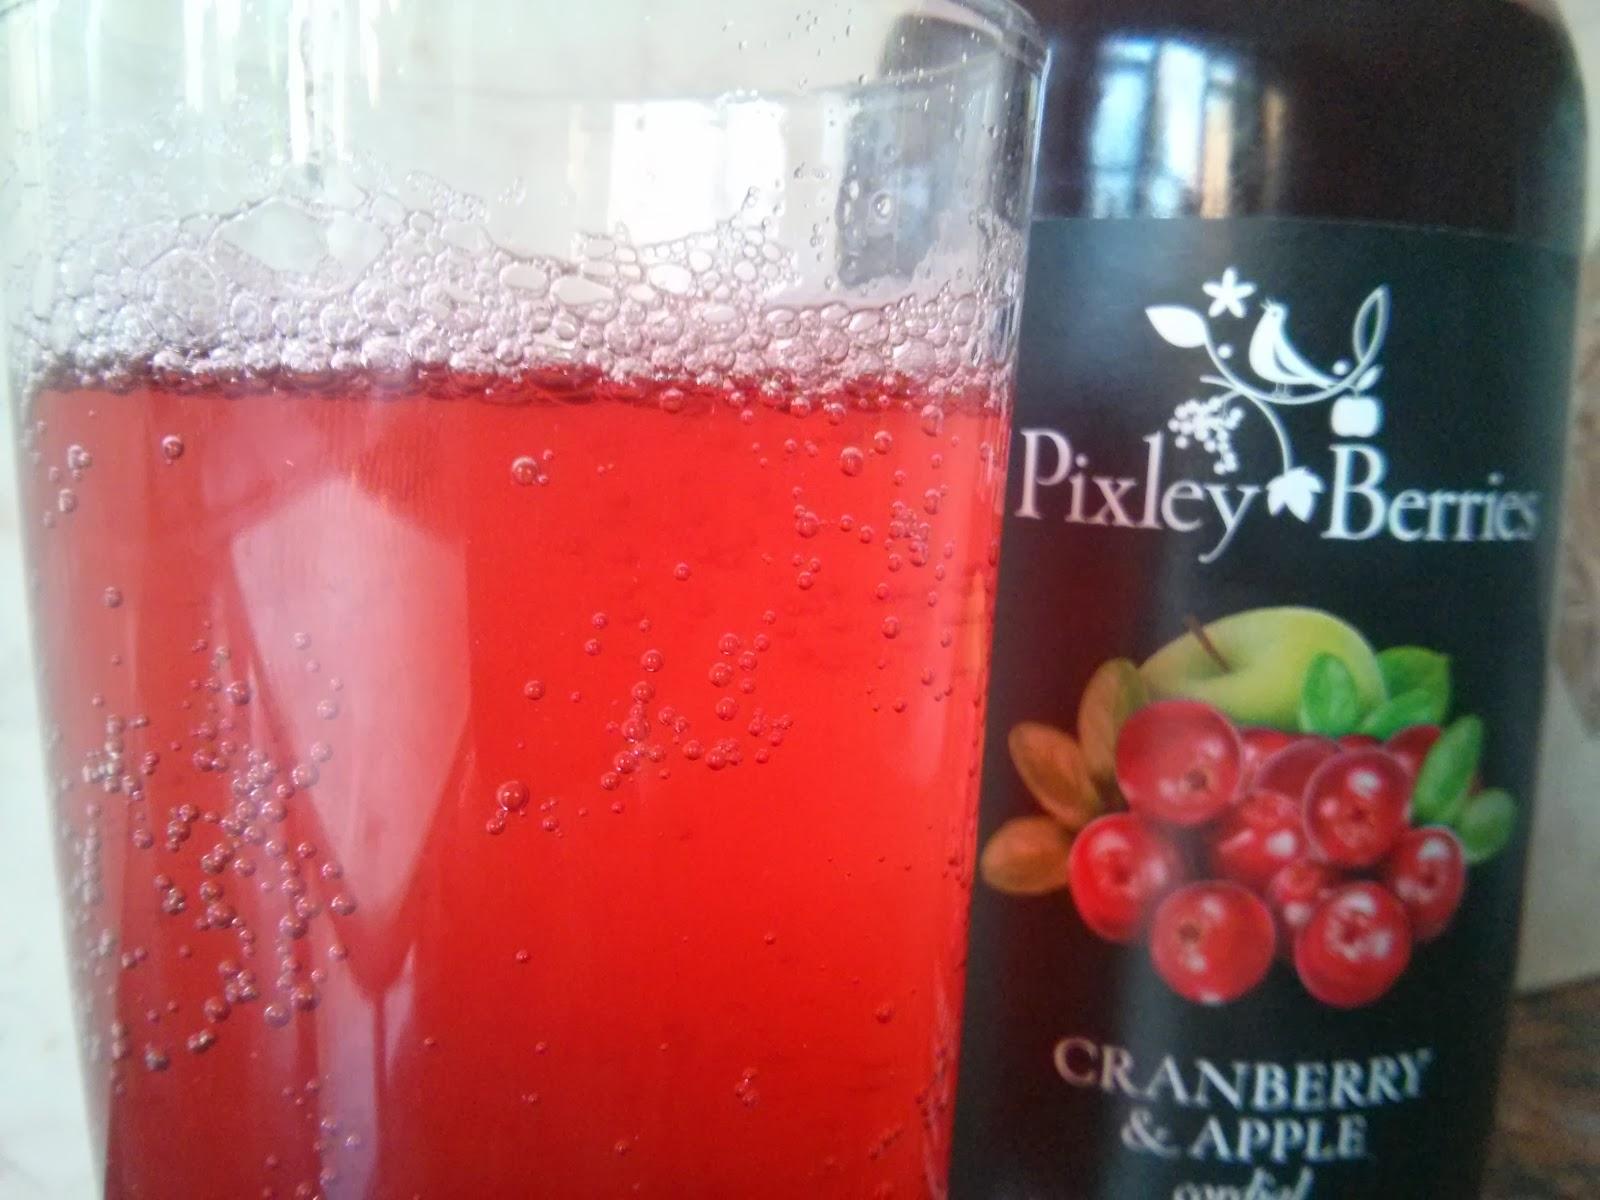 Pixley Berries cordial